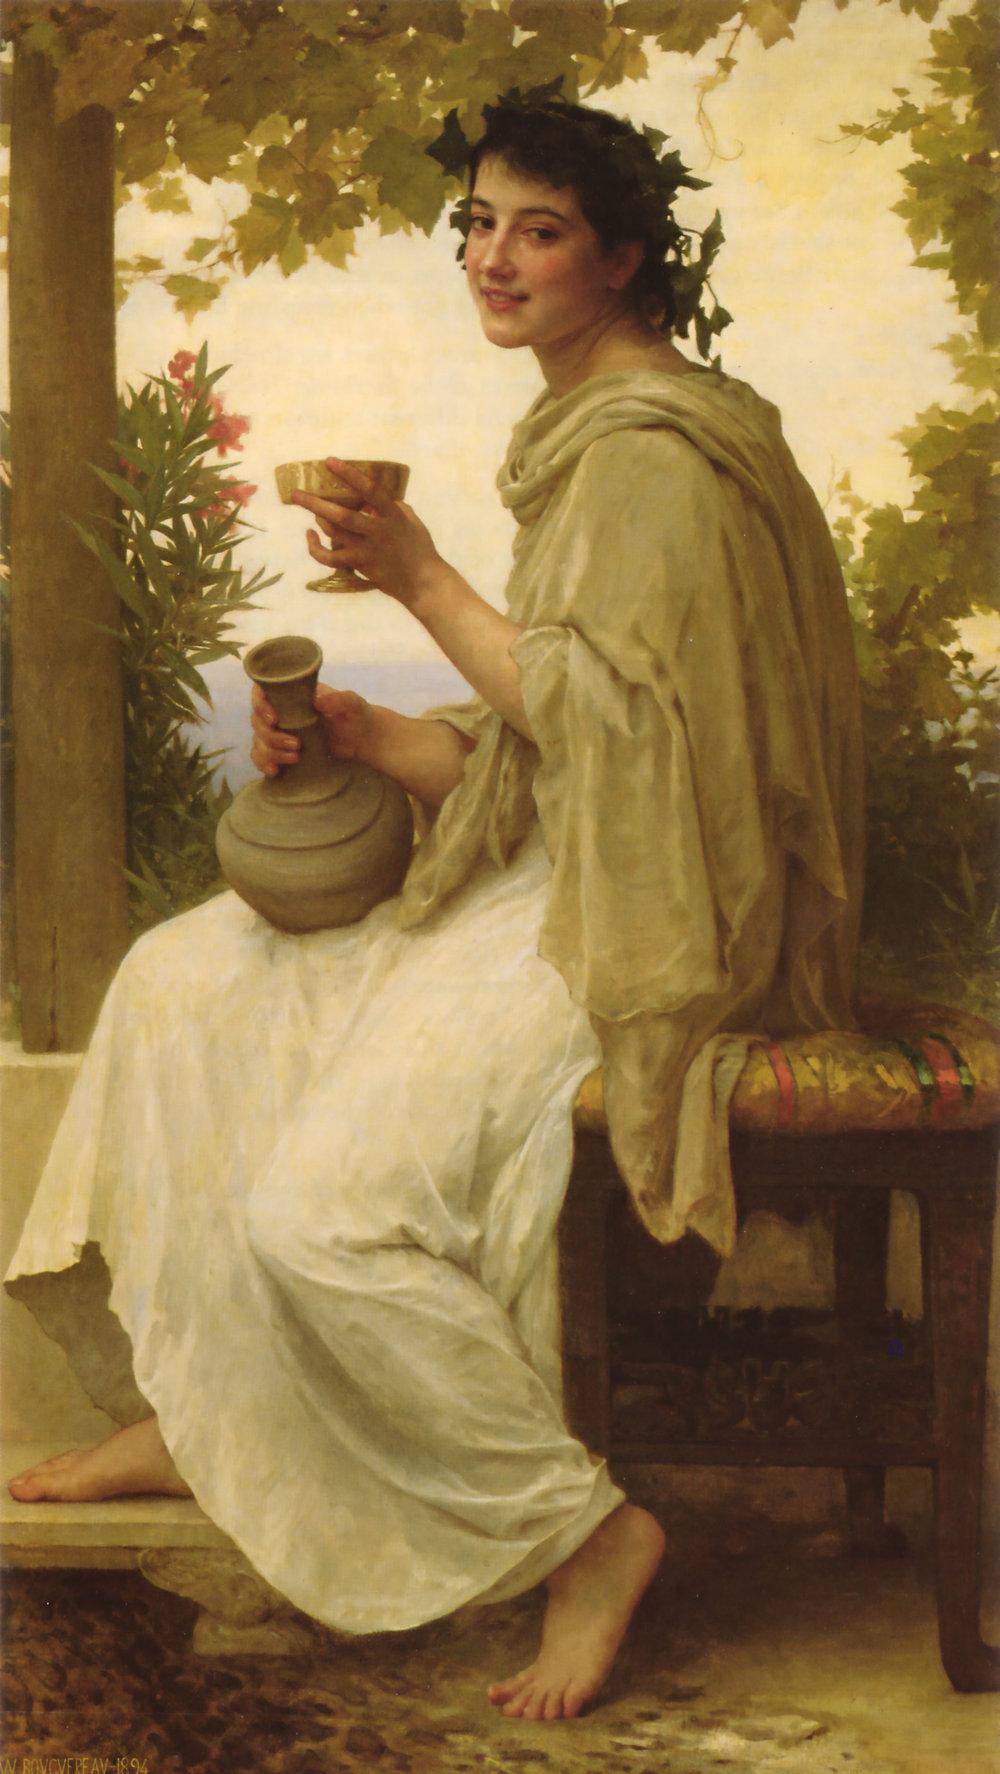 William Adolphe Bouguereau, Bacchante  (see 67 Across)